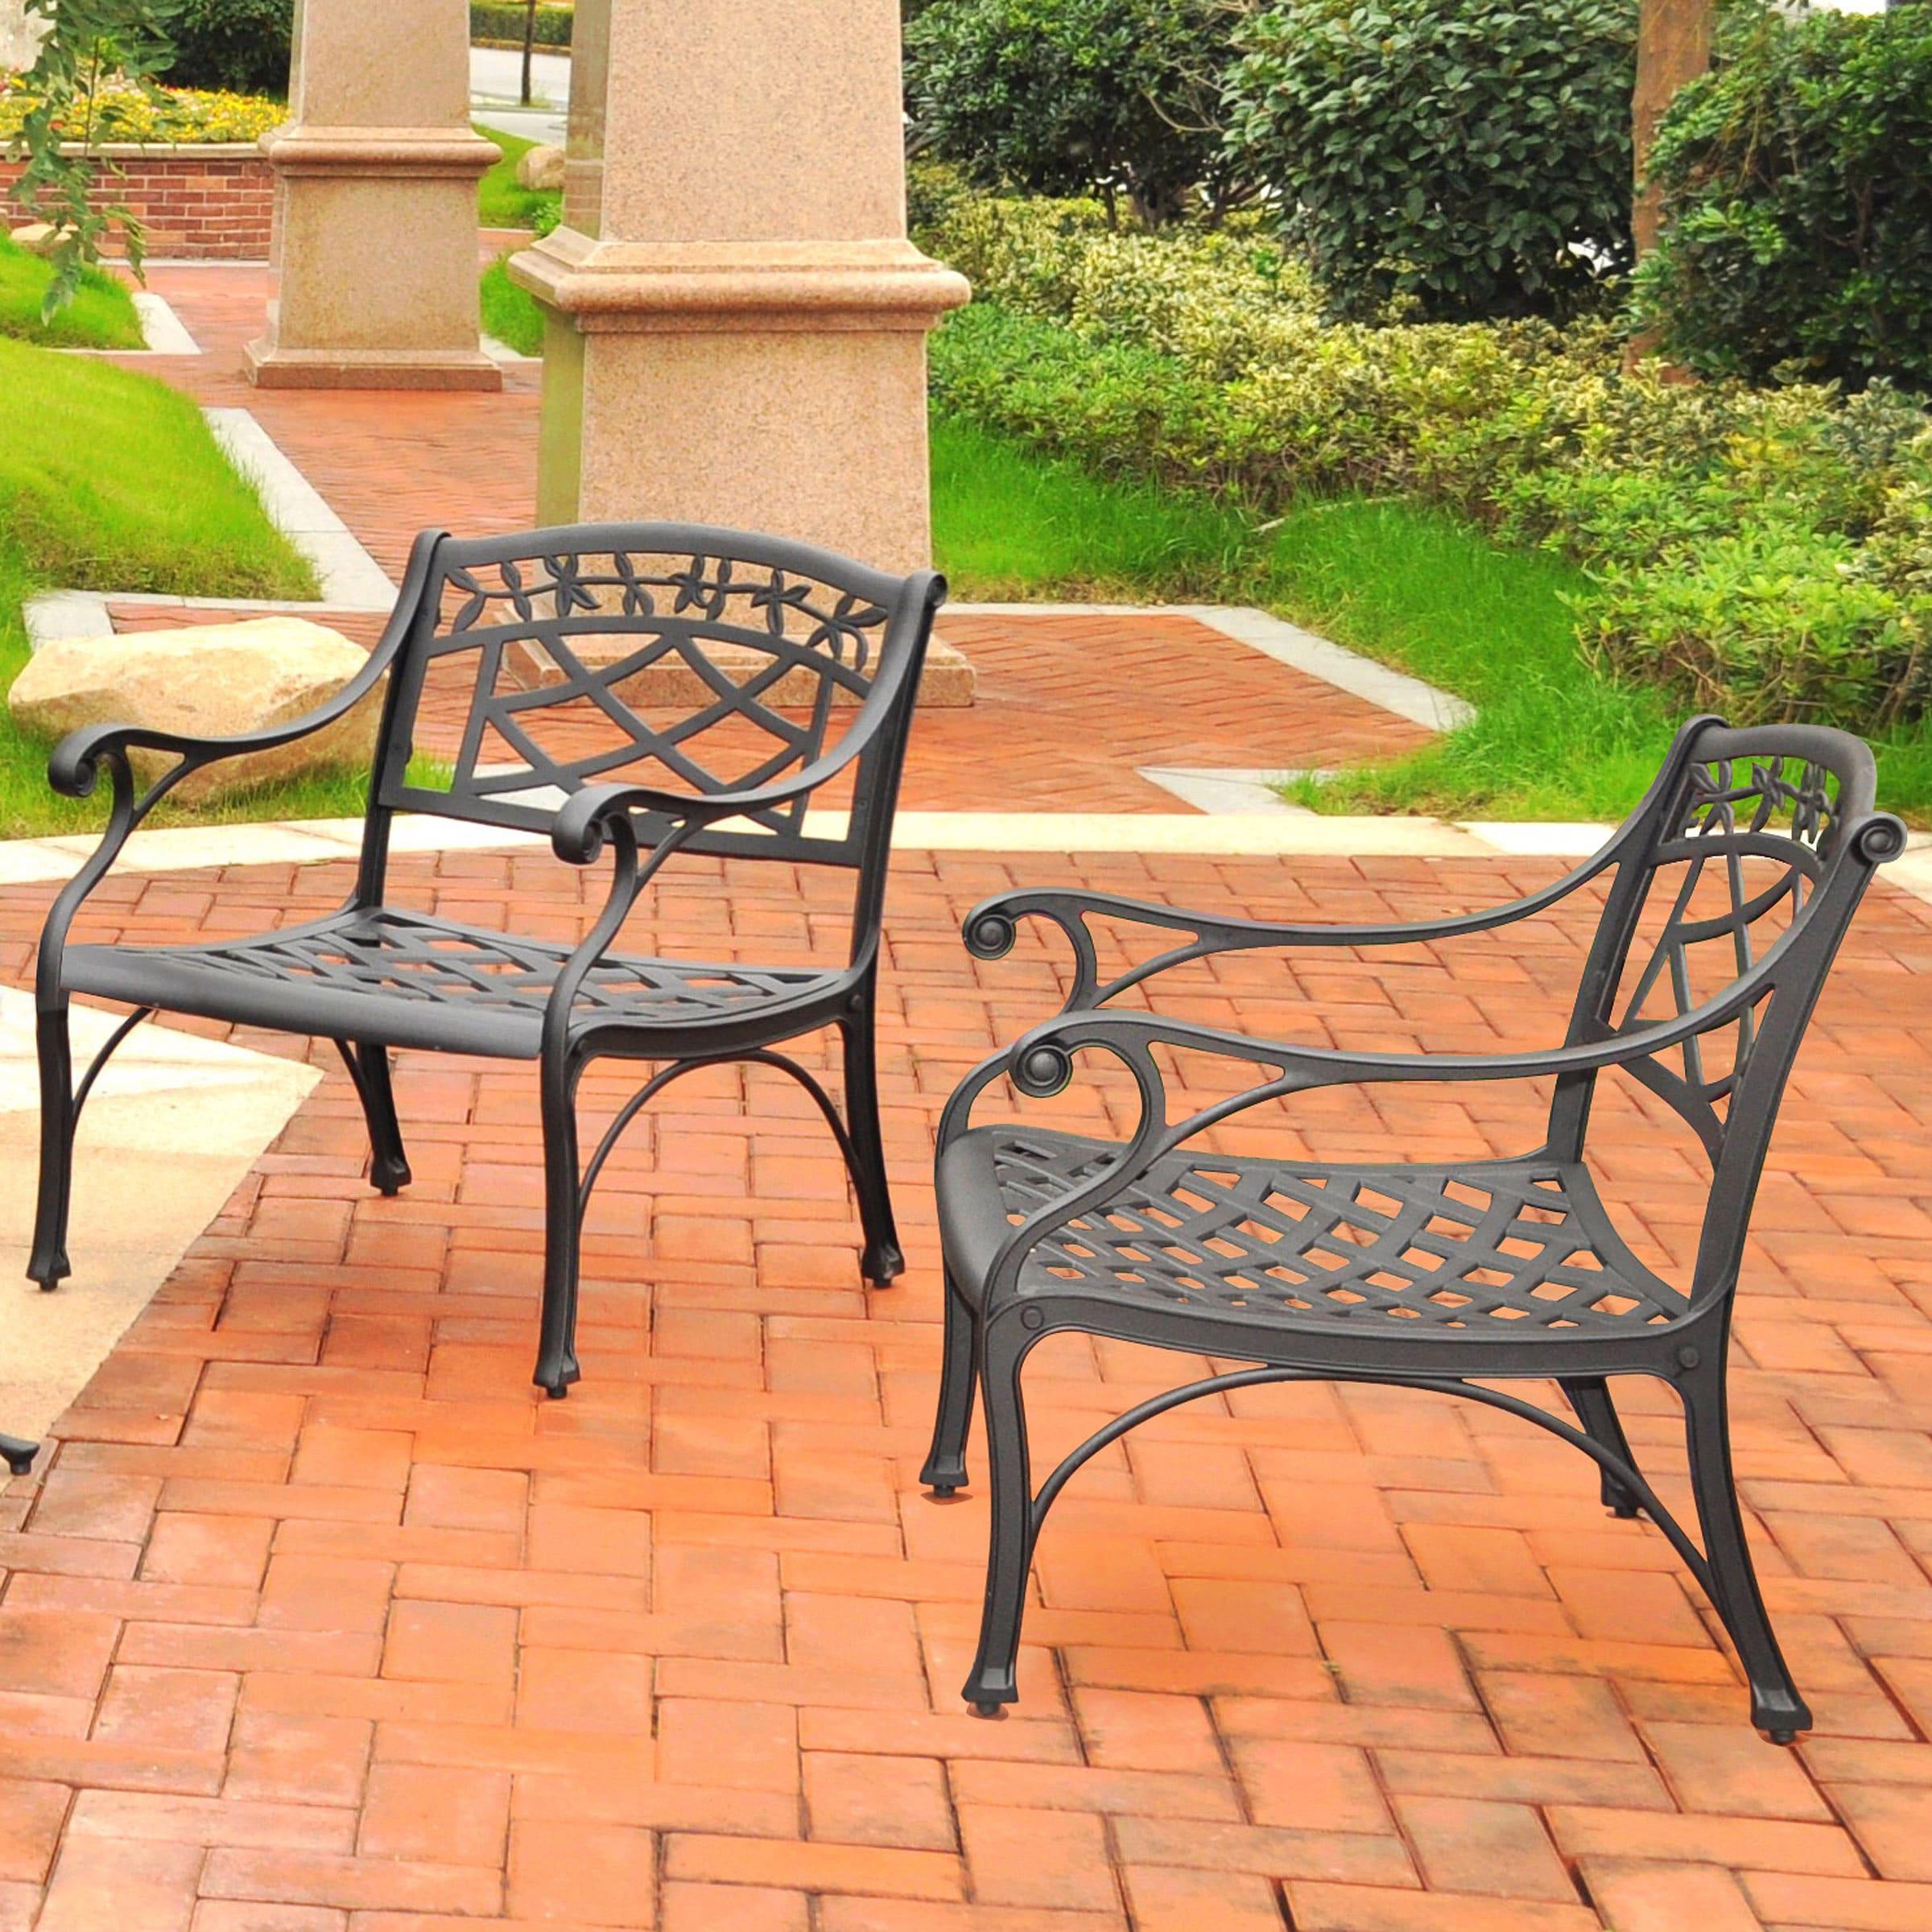 sedona 2 piece cast aluminum outdoor conversation seating set 2 club chairs black finish